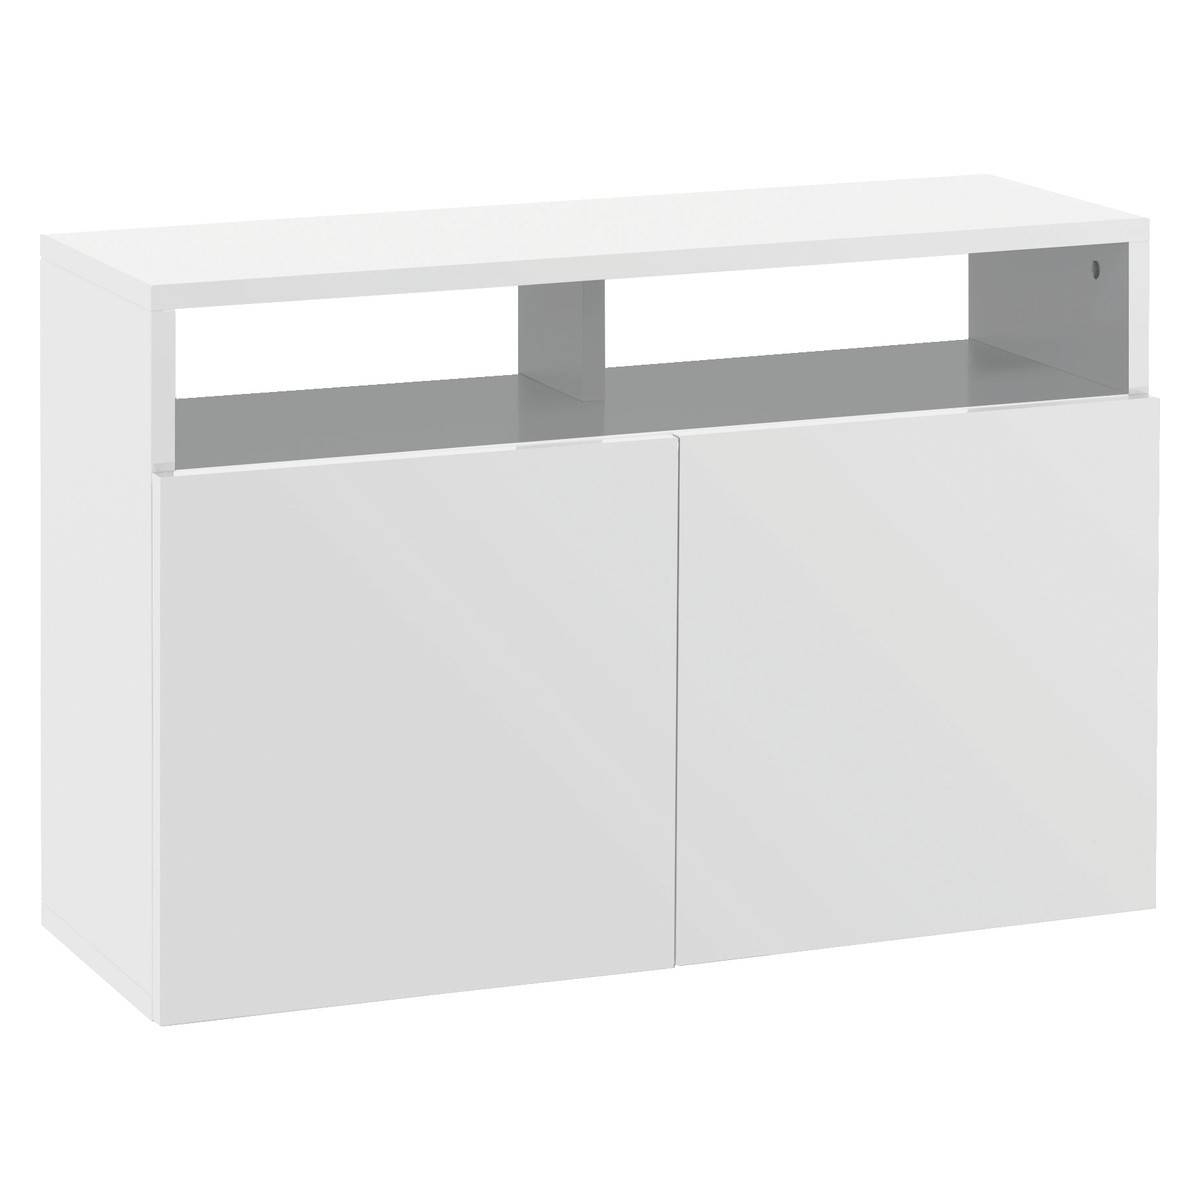 Sideboards, Cupboards & Cabinets In Oak & White – Habitat Uk Inside White High Gloss Sideboard (#17 of 20)